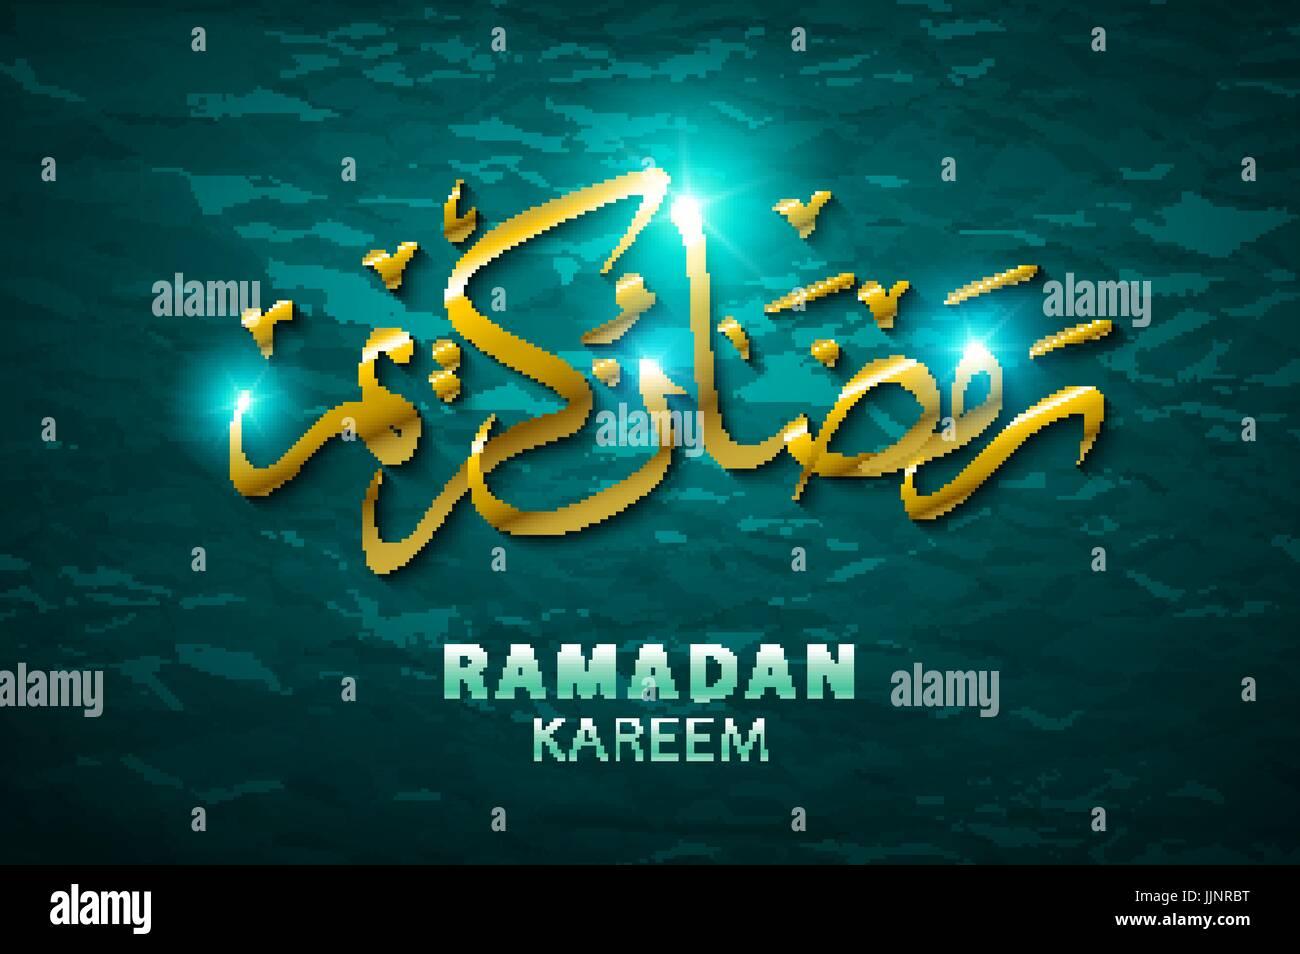 Ramadan greetings in arabic script an islamic greeting card for ramadan greetings in arabic script an islamic greeting card for holy month of ramadan kareem eps 10 vector illustration art m4hsunfo